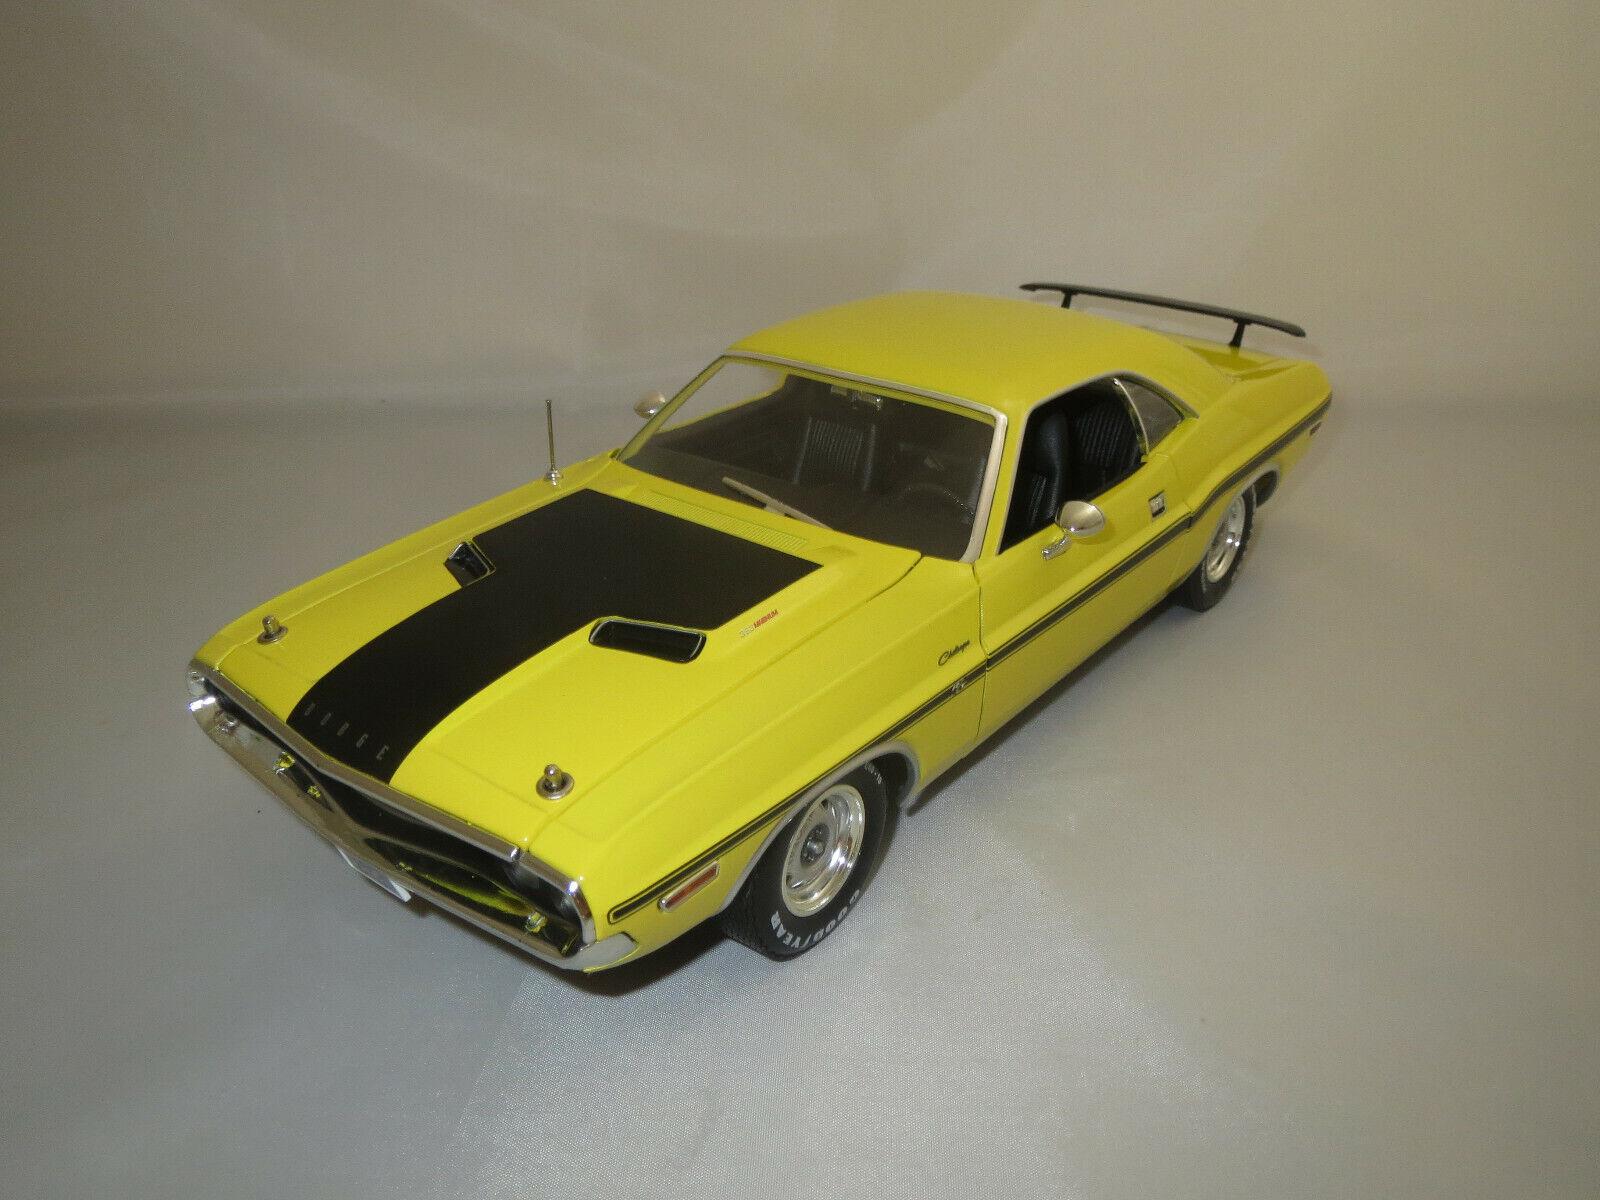 vertlumière  183209 Dodge Challenger R T (jaune noir mat) 1 18 neuf dans sa boîte  prix bas 40%